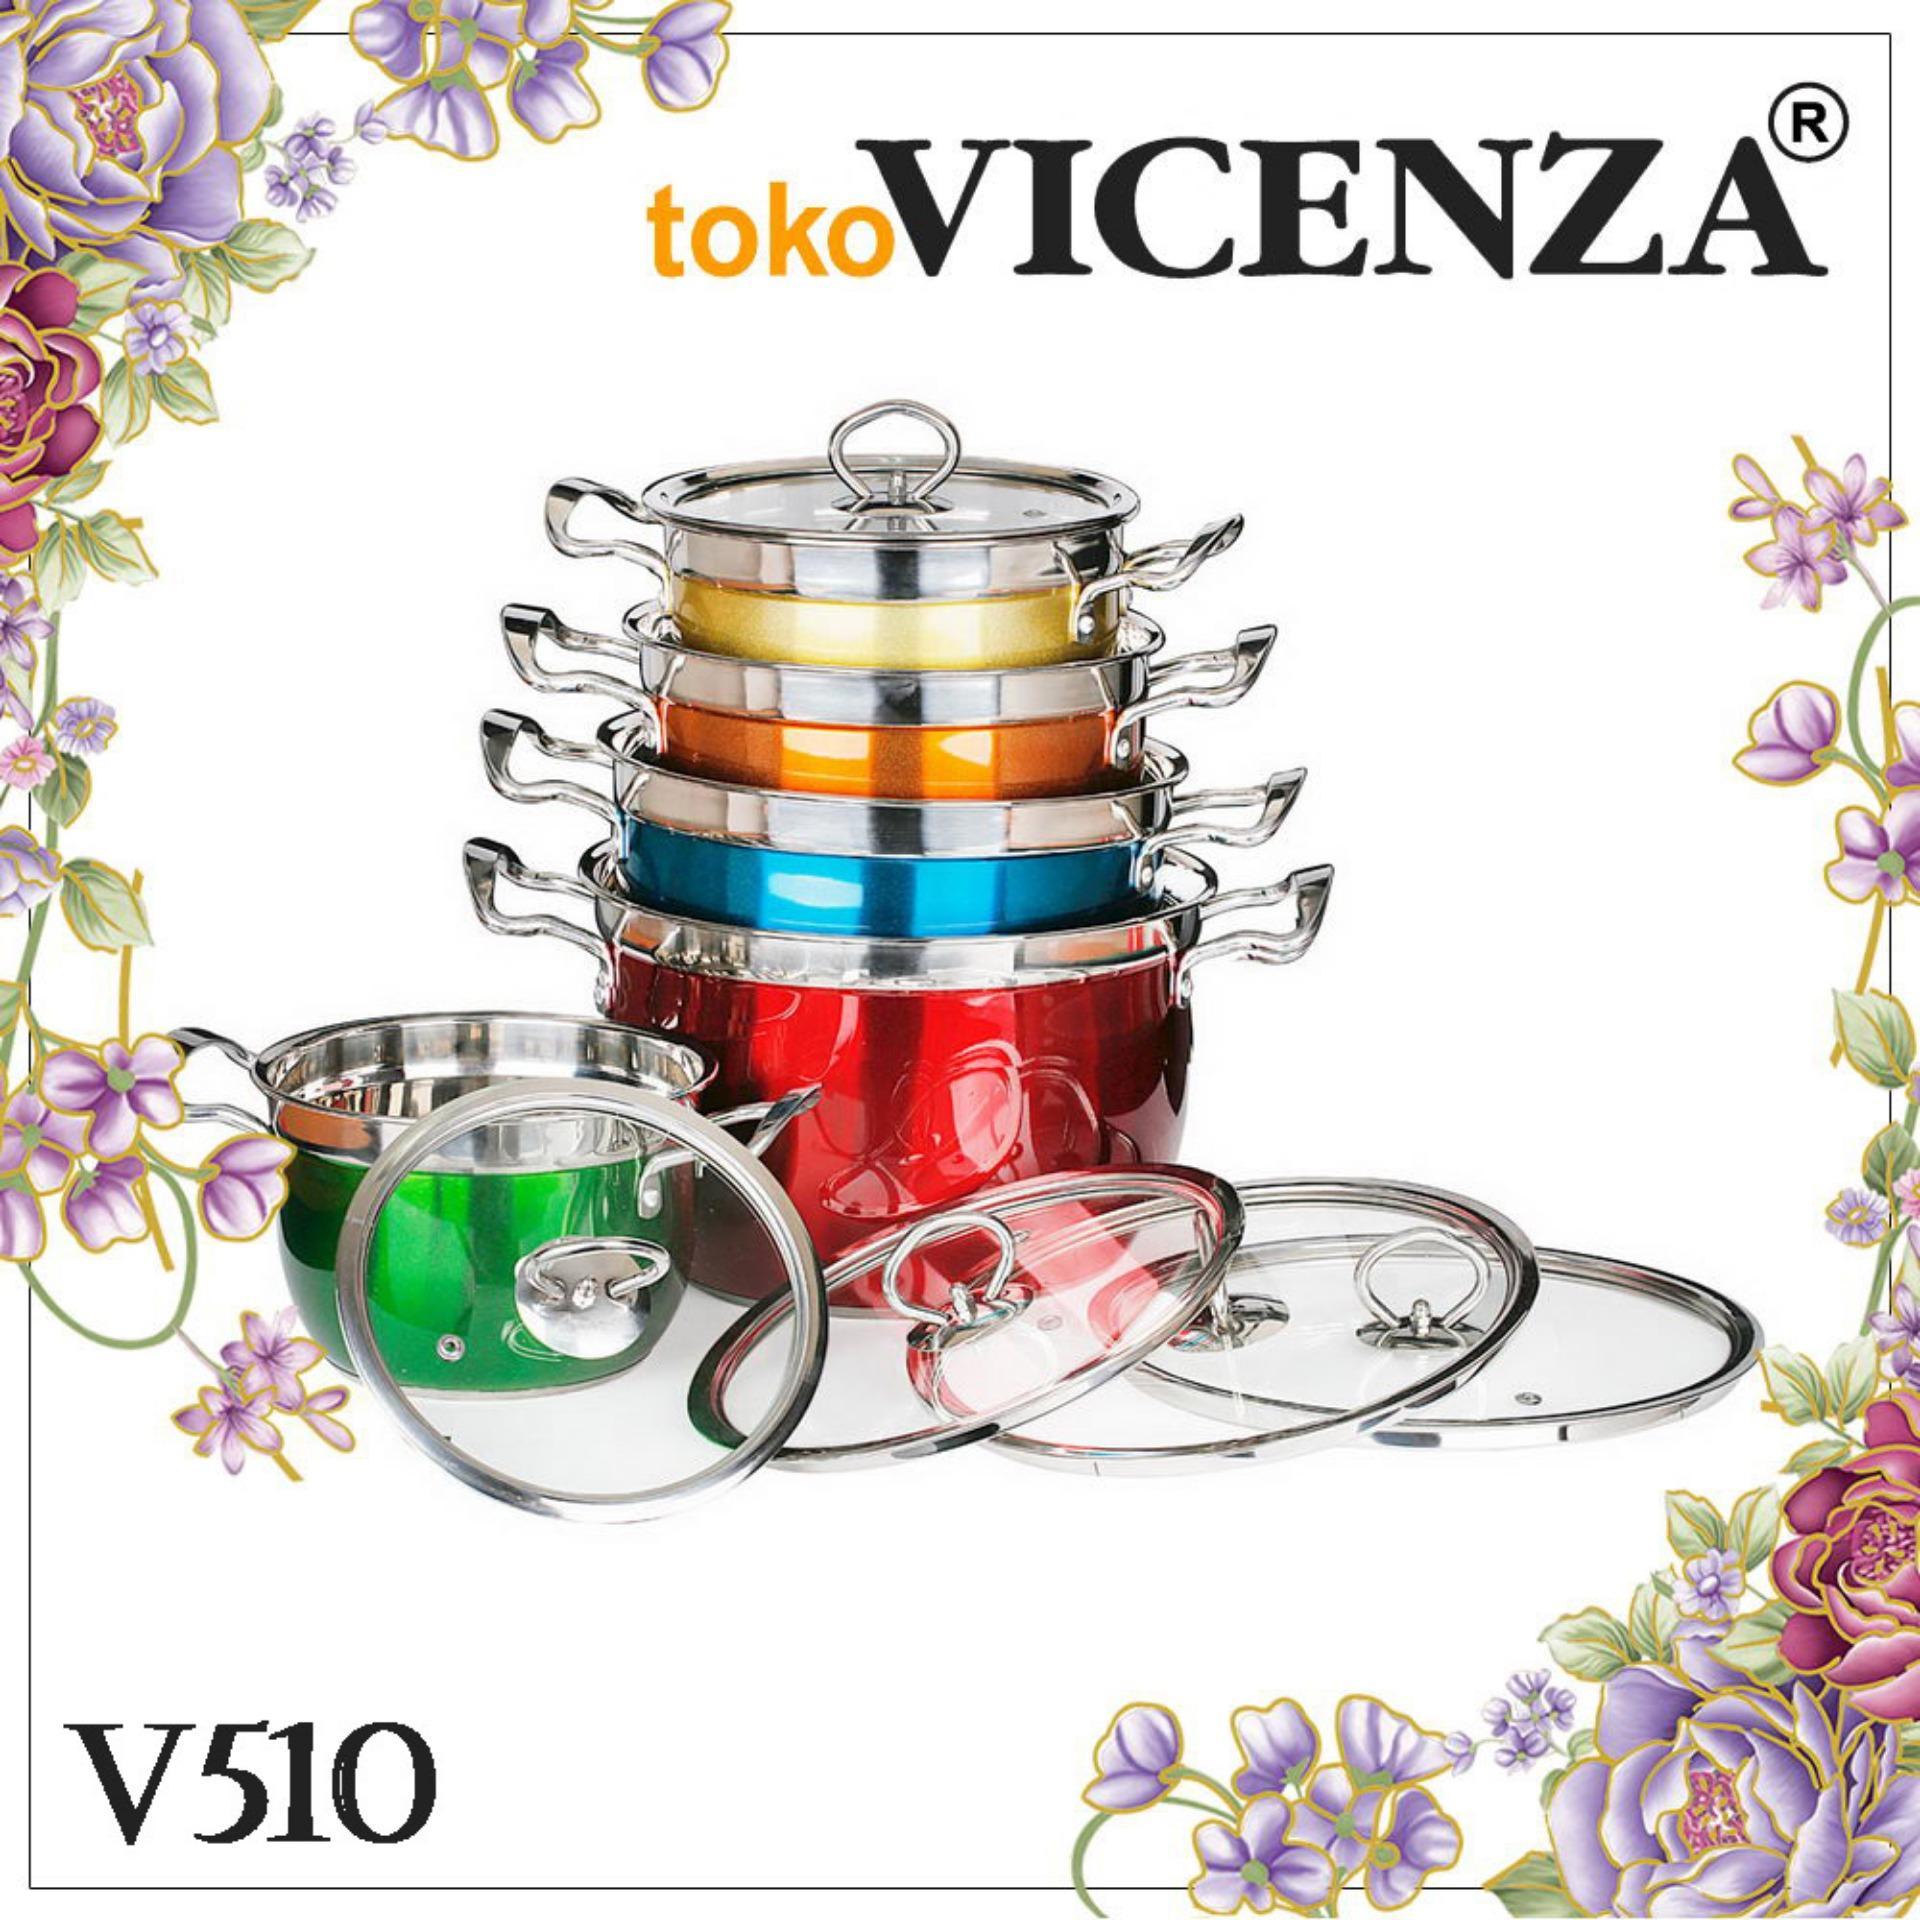 Vicenza Panci Rainbow Set  - Panci Warna Warni V510